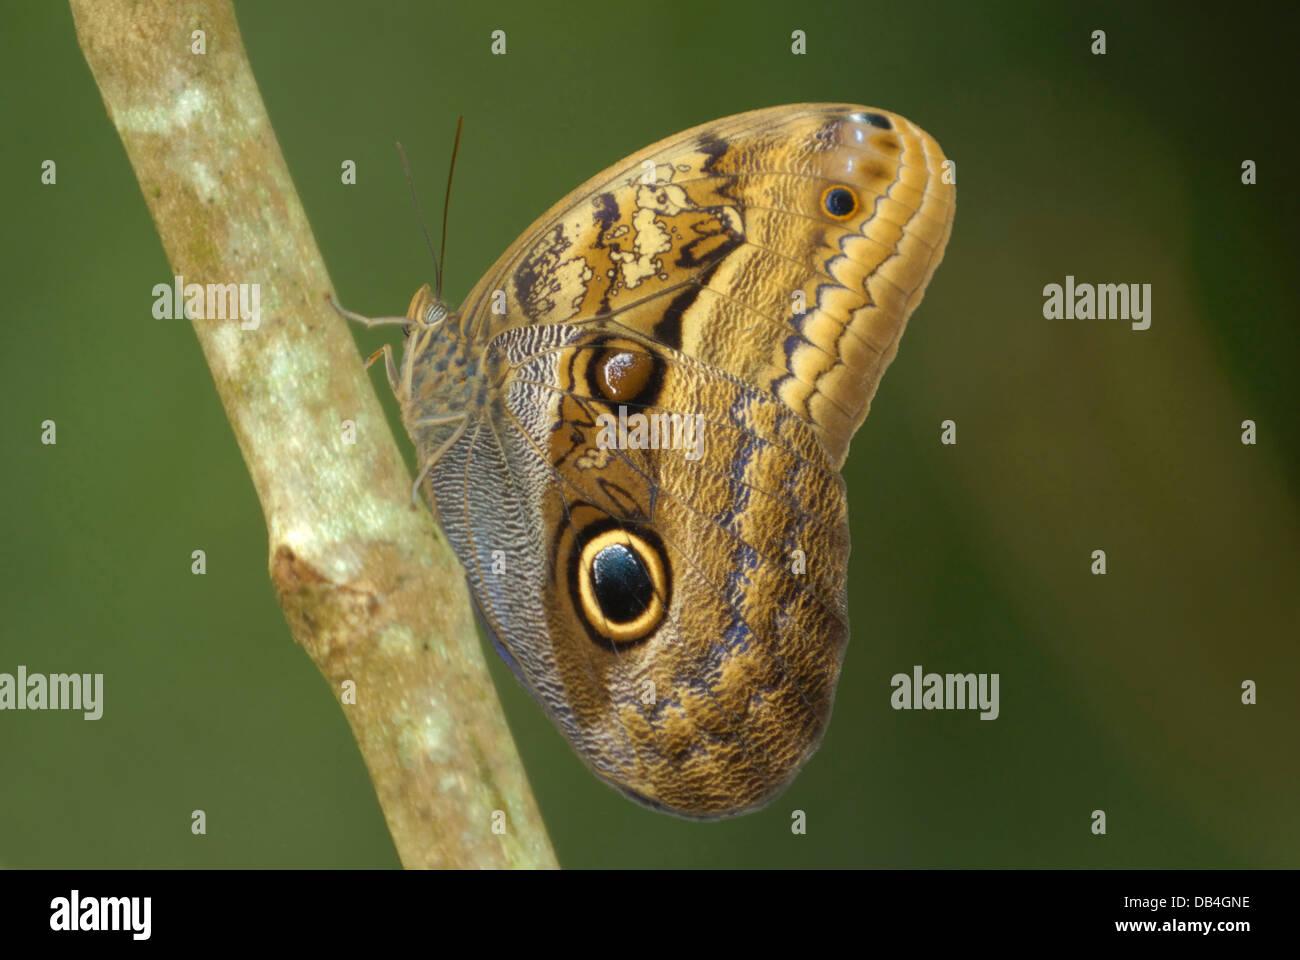 Altrosa Riesen Eule Schmetterling (Caligo Illionius) im Regenwald von Costa Rica Stockbild